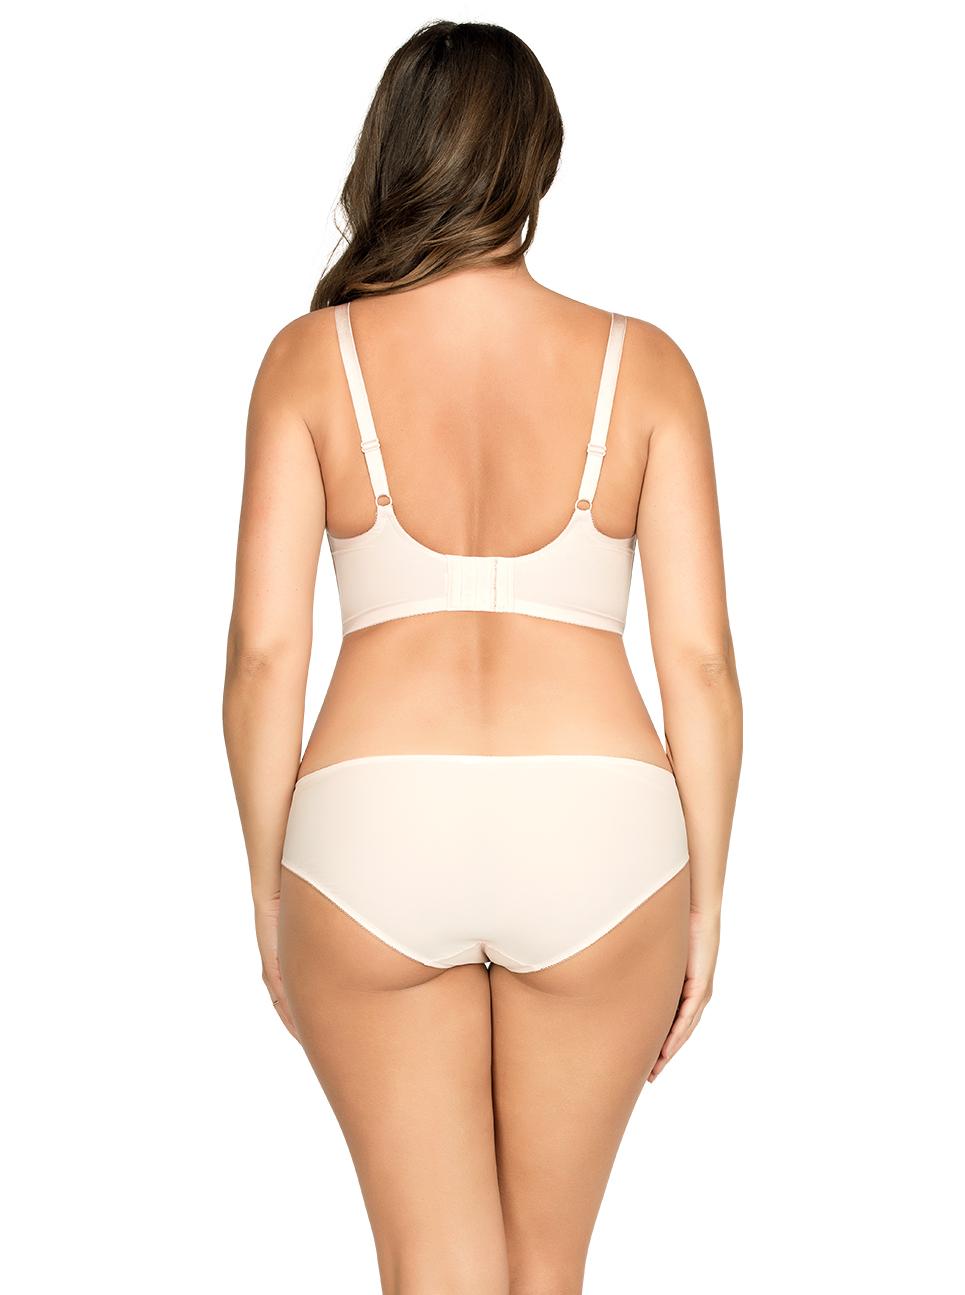 PARFAIT Cora UnlinedLonglineBraP5632 BikiniP5633 Back - Cora Unlined Longline Bra - Pale Blush - P5632